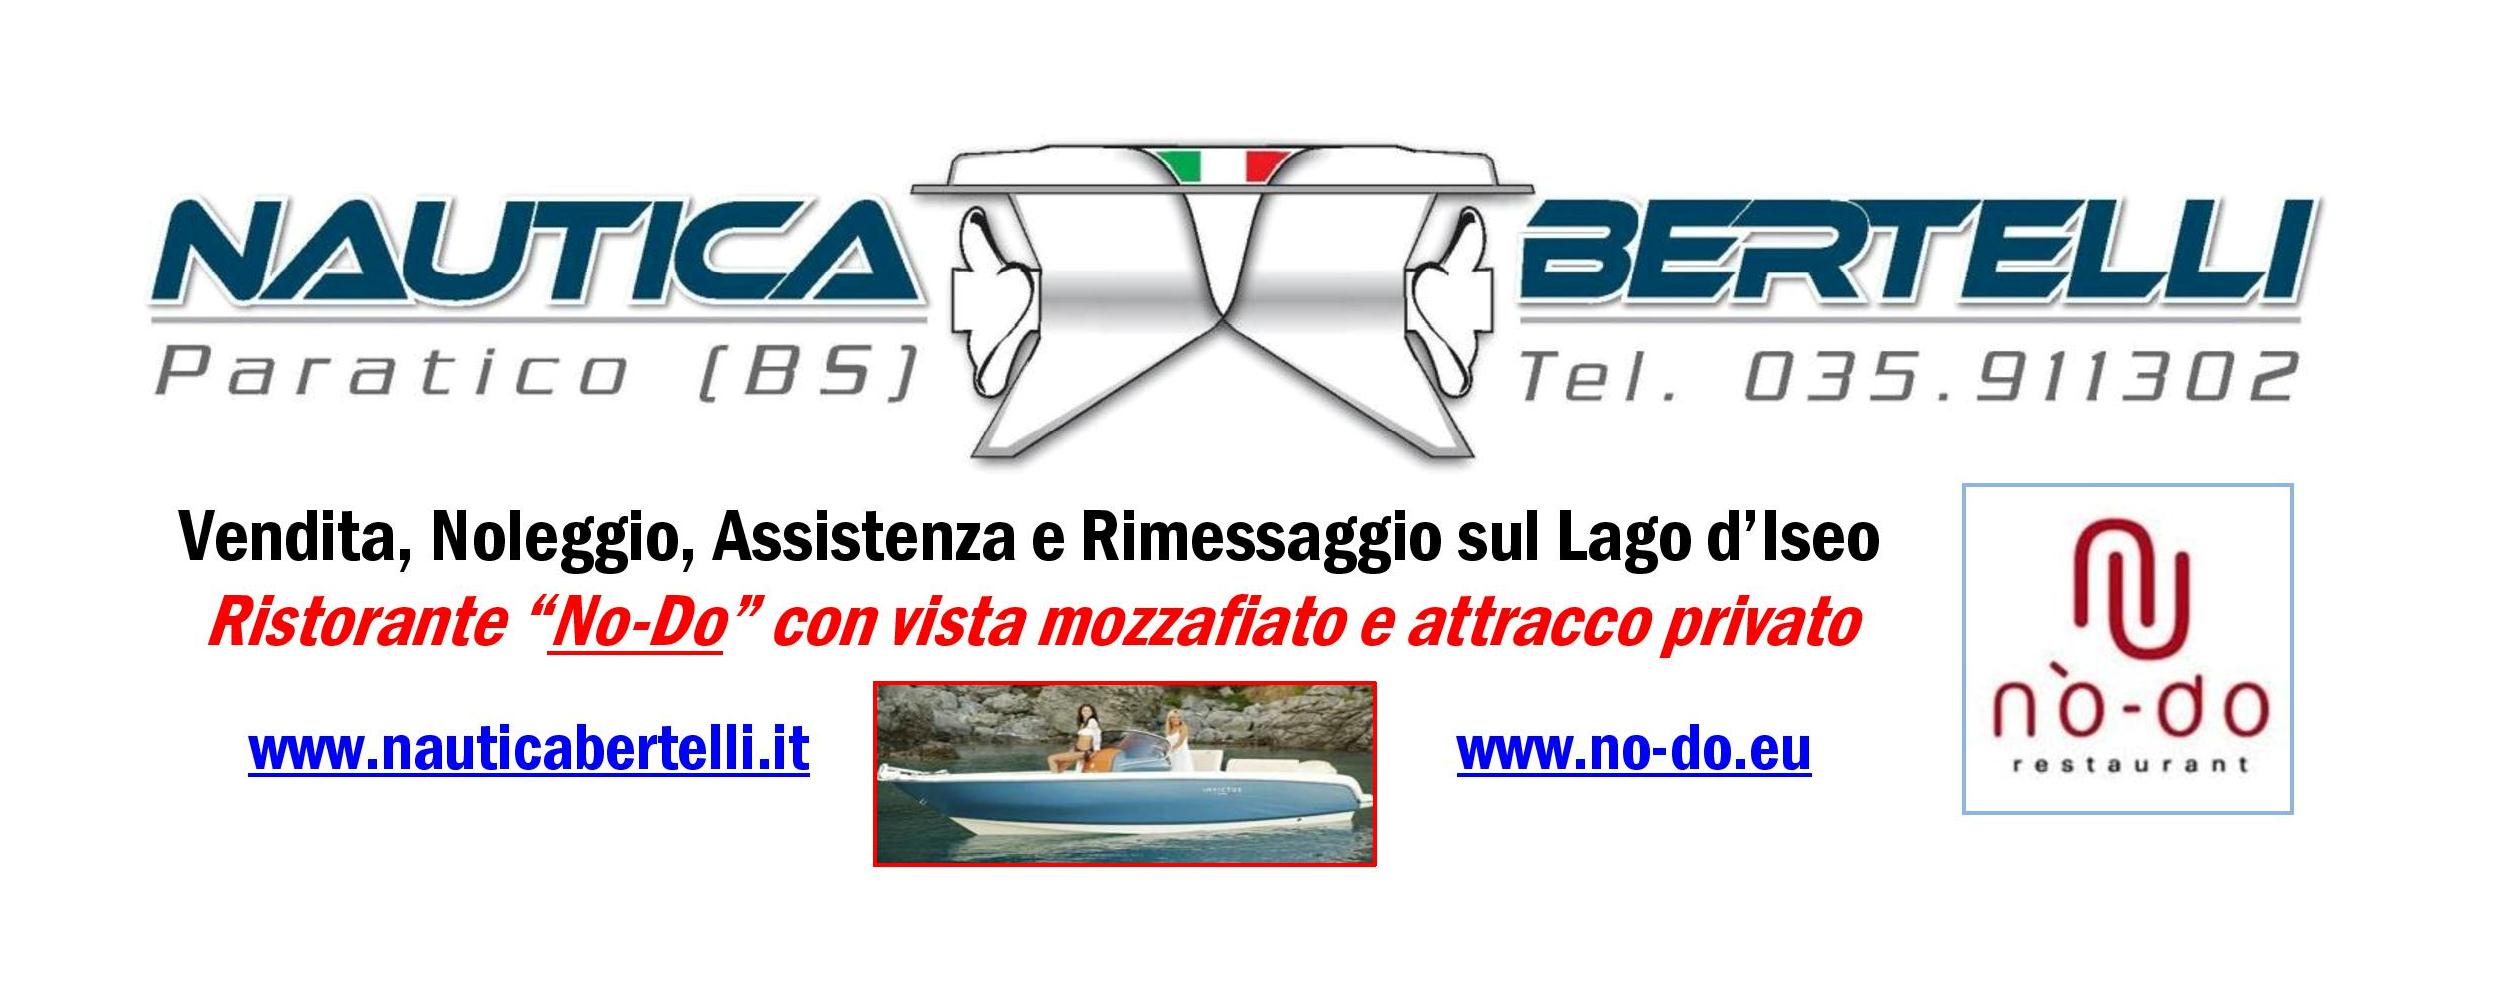 10) Nautica Bertelli